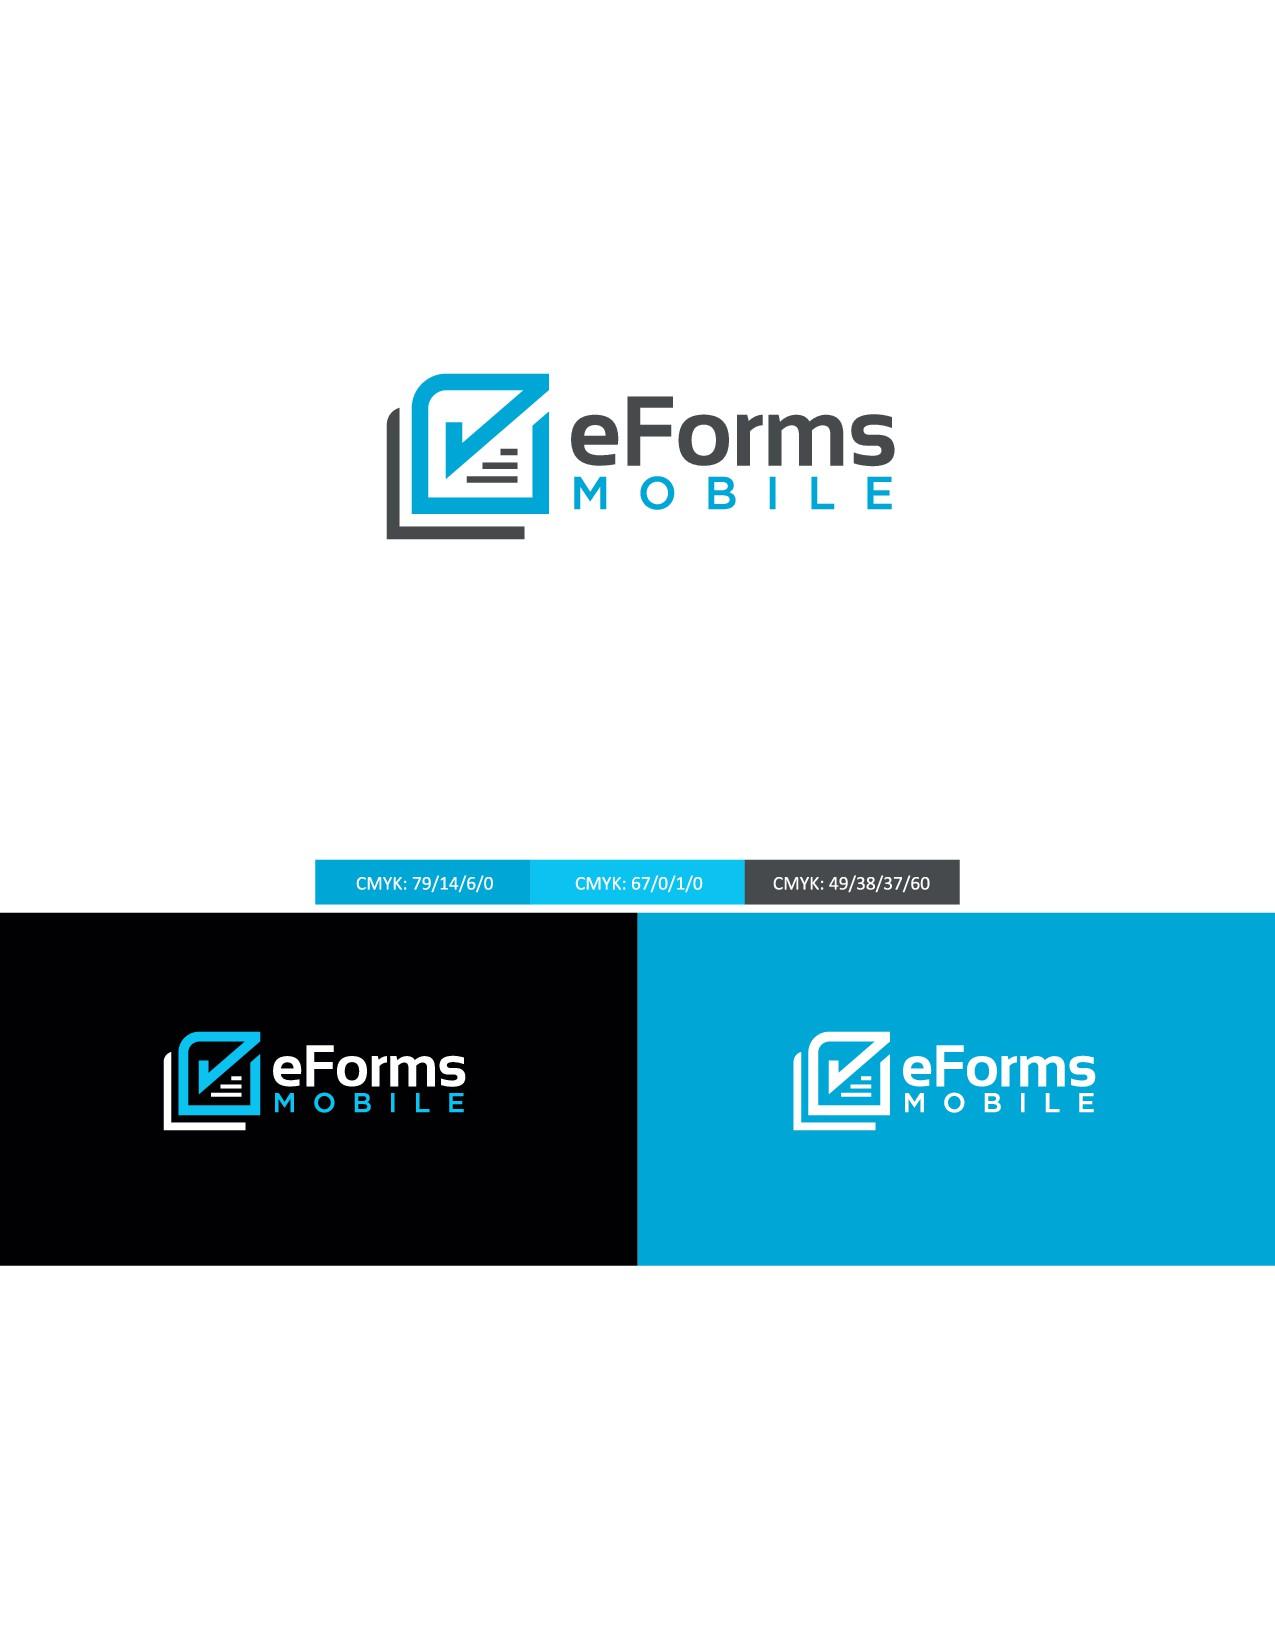 eForms Mobile